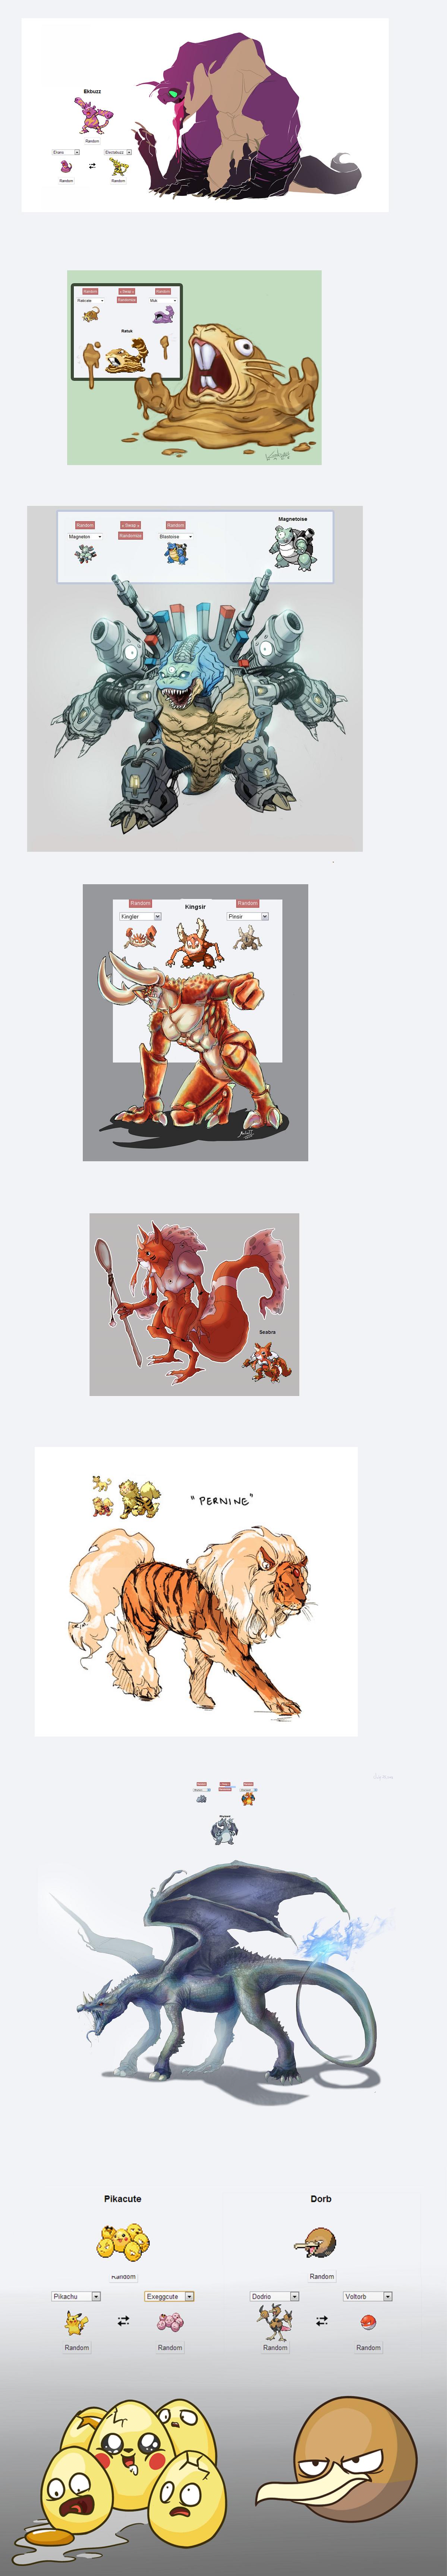 fusion 2. .. Does anyone else think they should make a Pokemon Fusion Series next? HERESY mutation Fusion Gay rights nasty